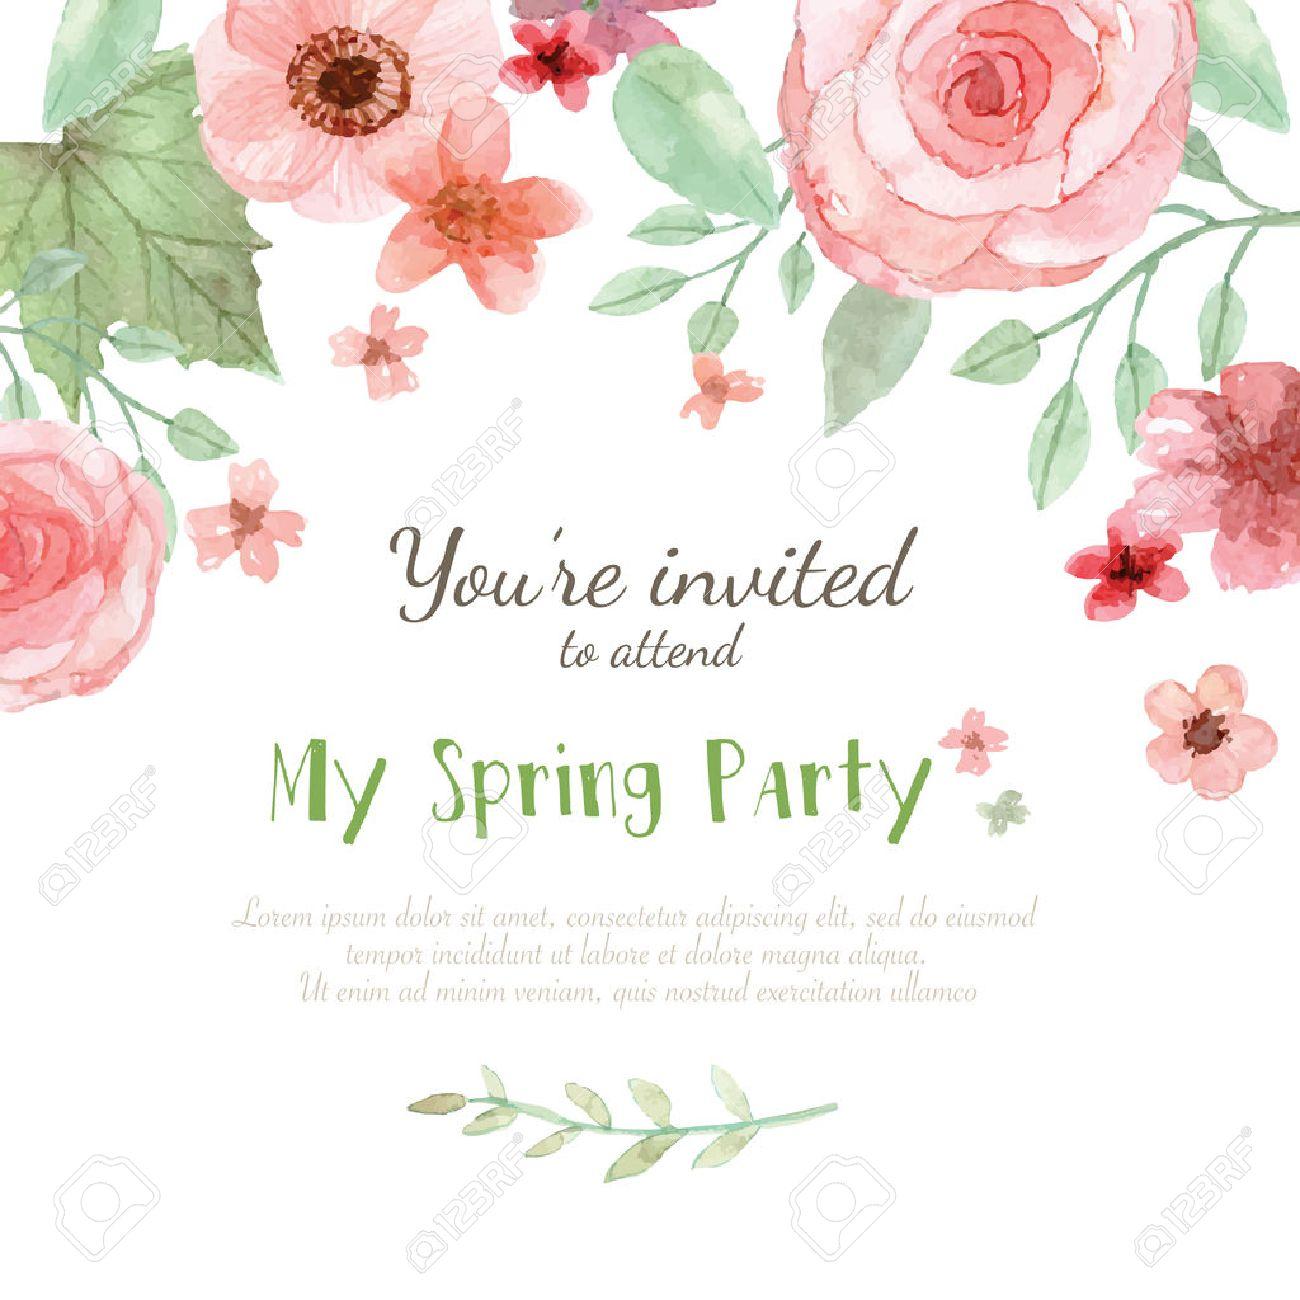 Flower Wedding Invitation Card Save The Date Card Greeting – An Invitation Card